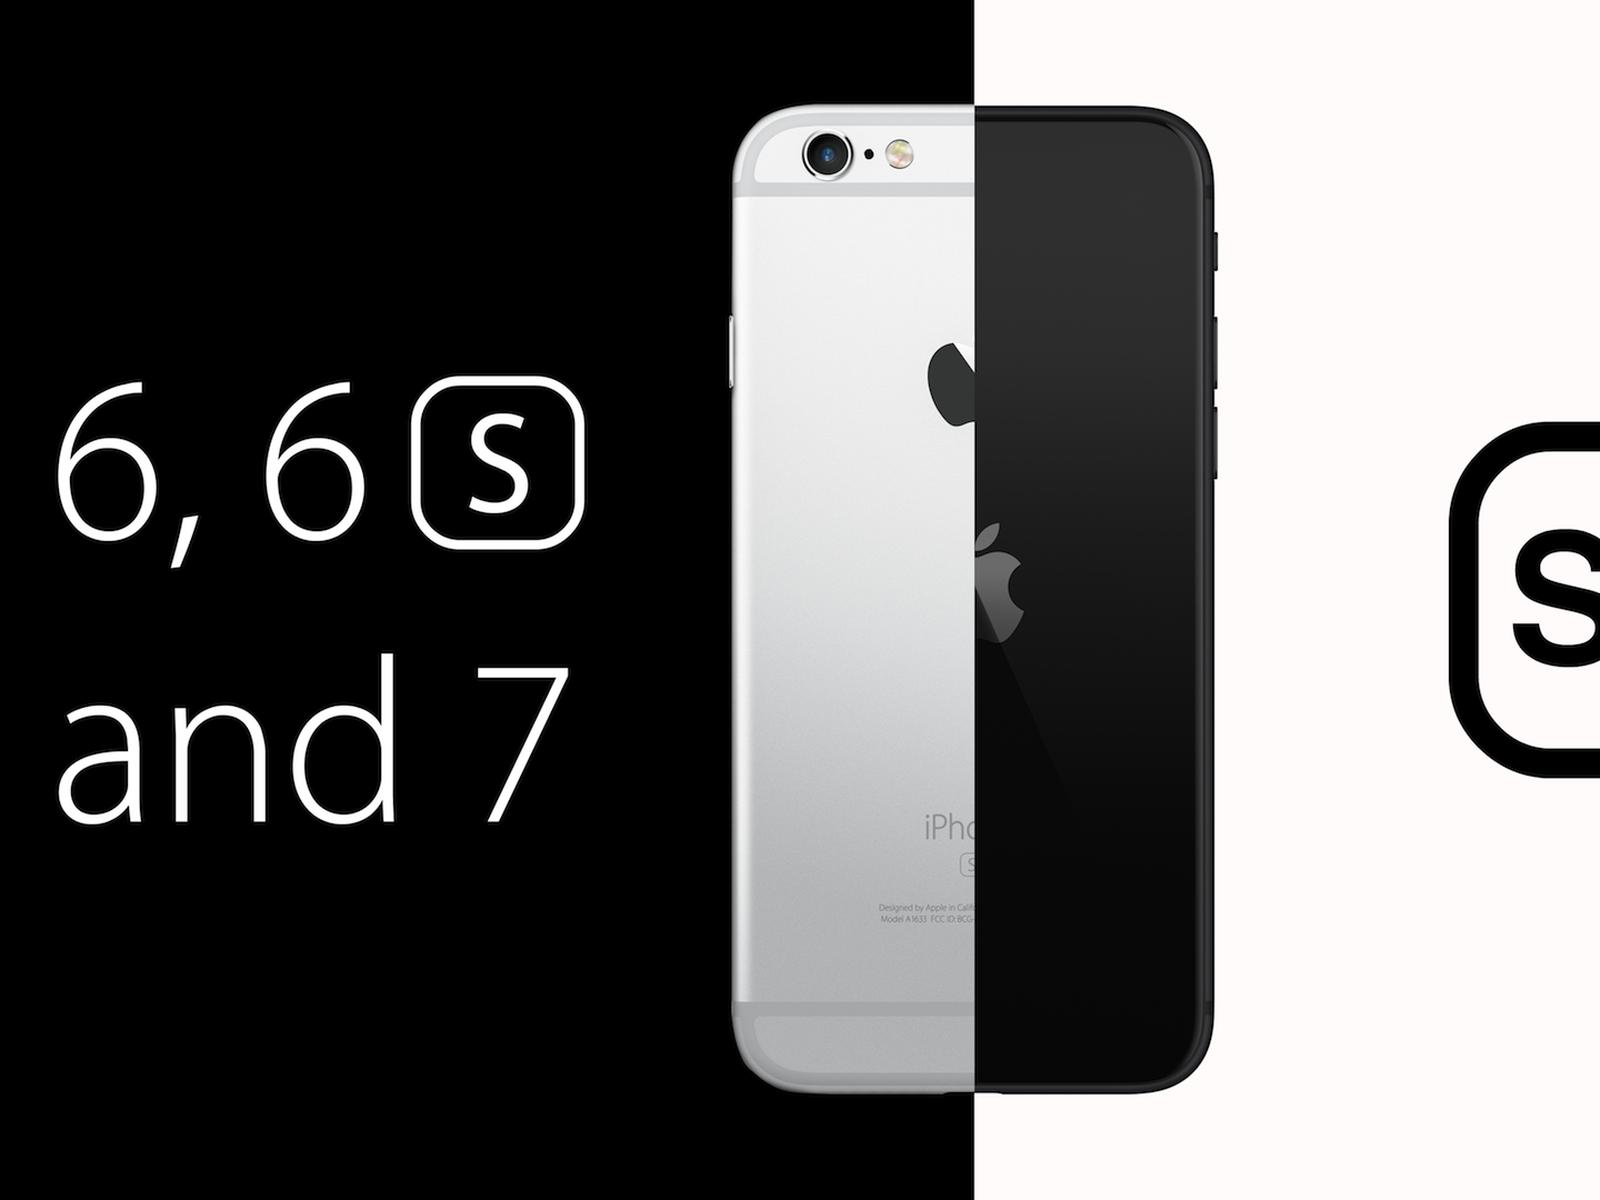 Iphone 6 6s 7 Vs Iphone Se Should You Upgrade Macrumors